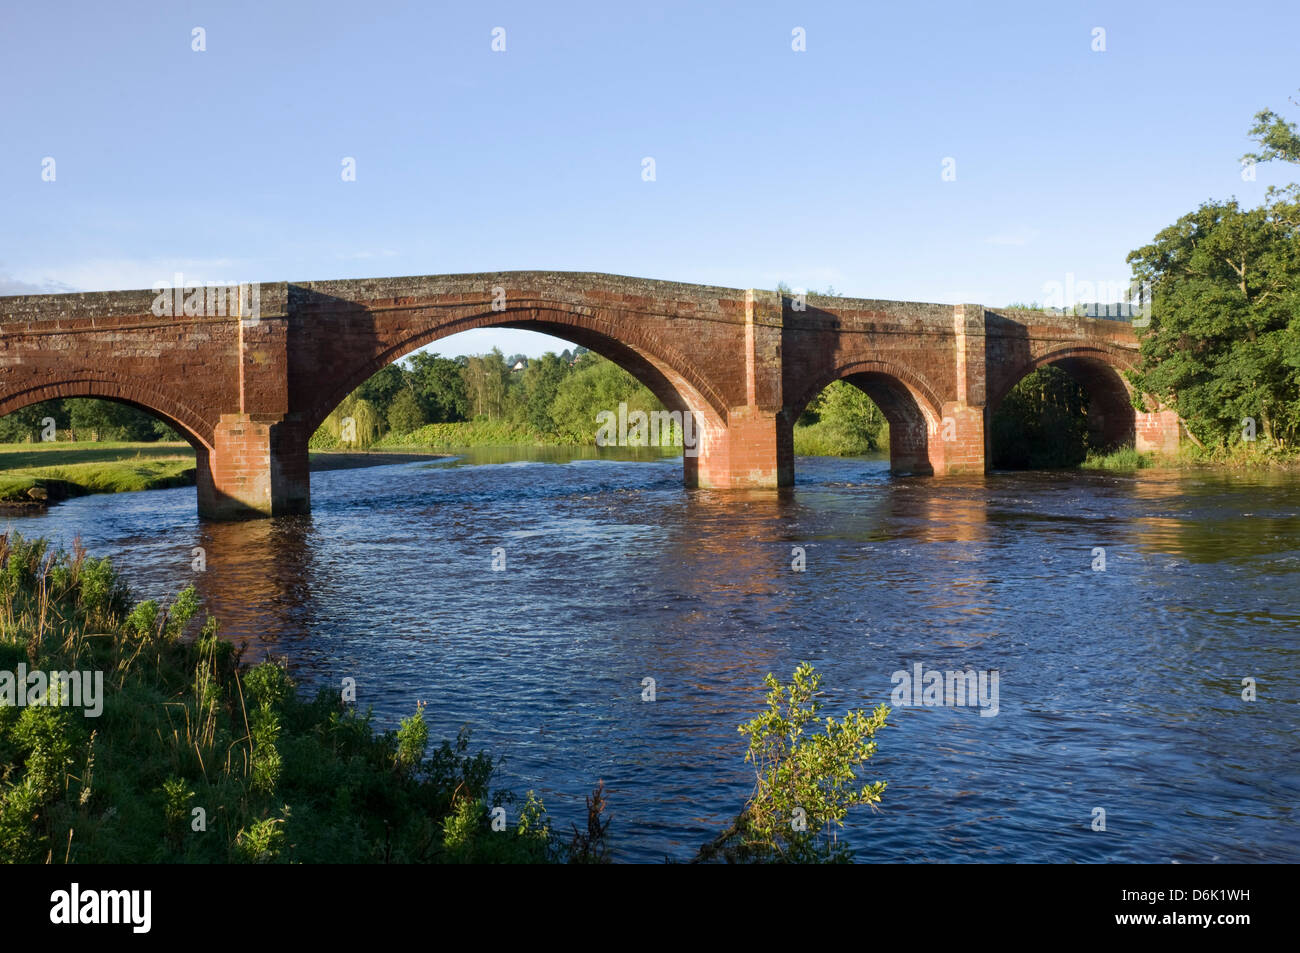 Eden Bridge, Lazonby, Eden Valley, Cumbria, England, United Kingdom, Europe - Stock Image